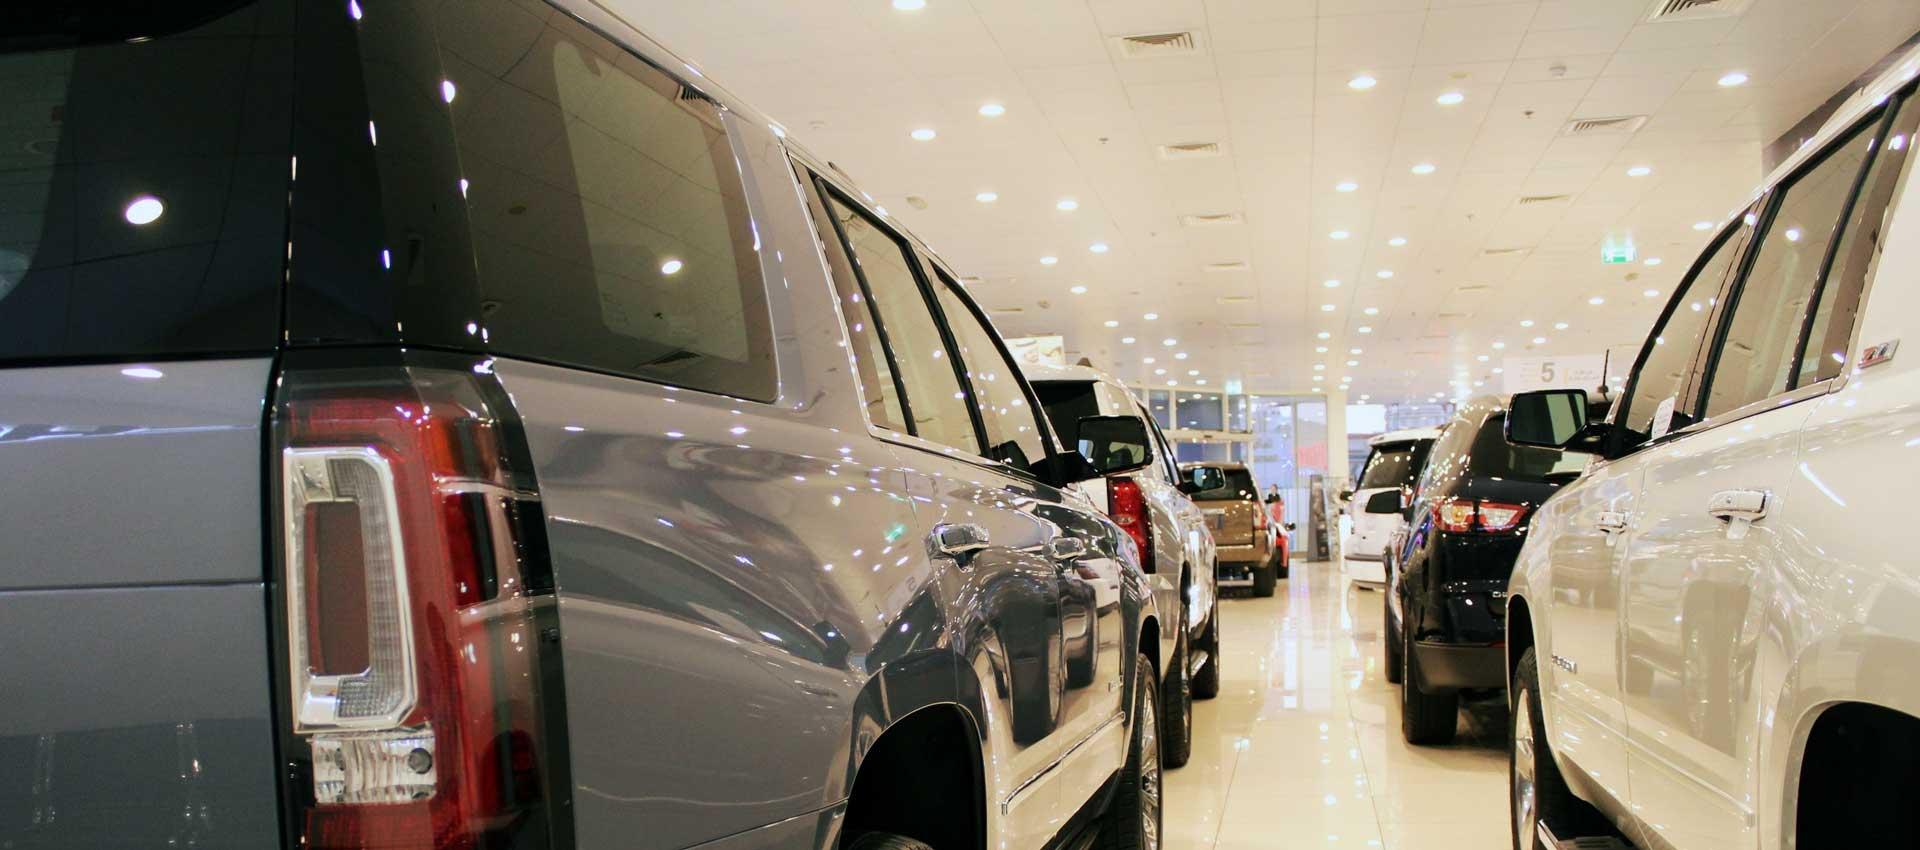 Conducting Safe Business In Car Showrooms Following Coronavirus Button